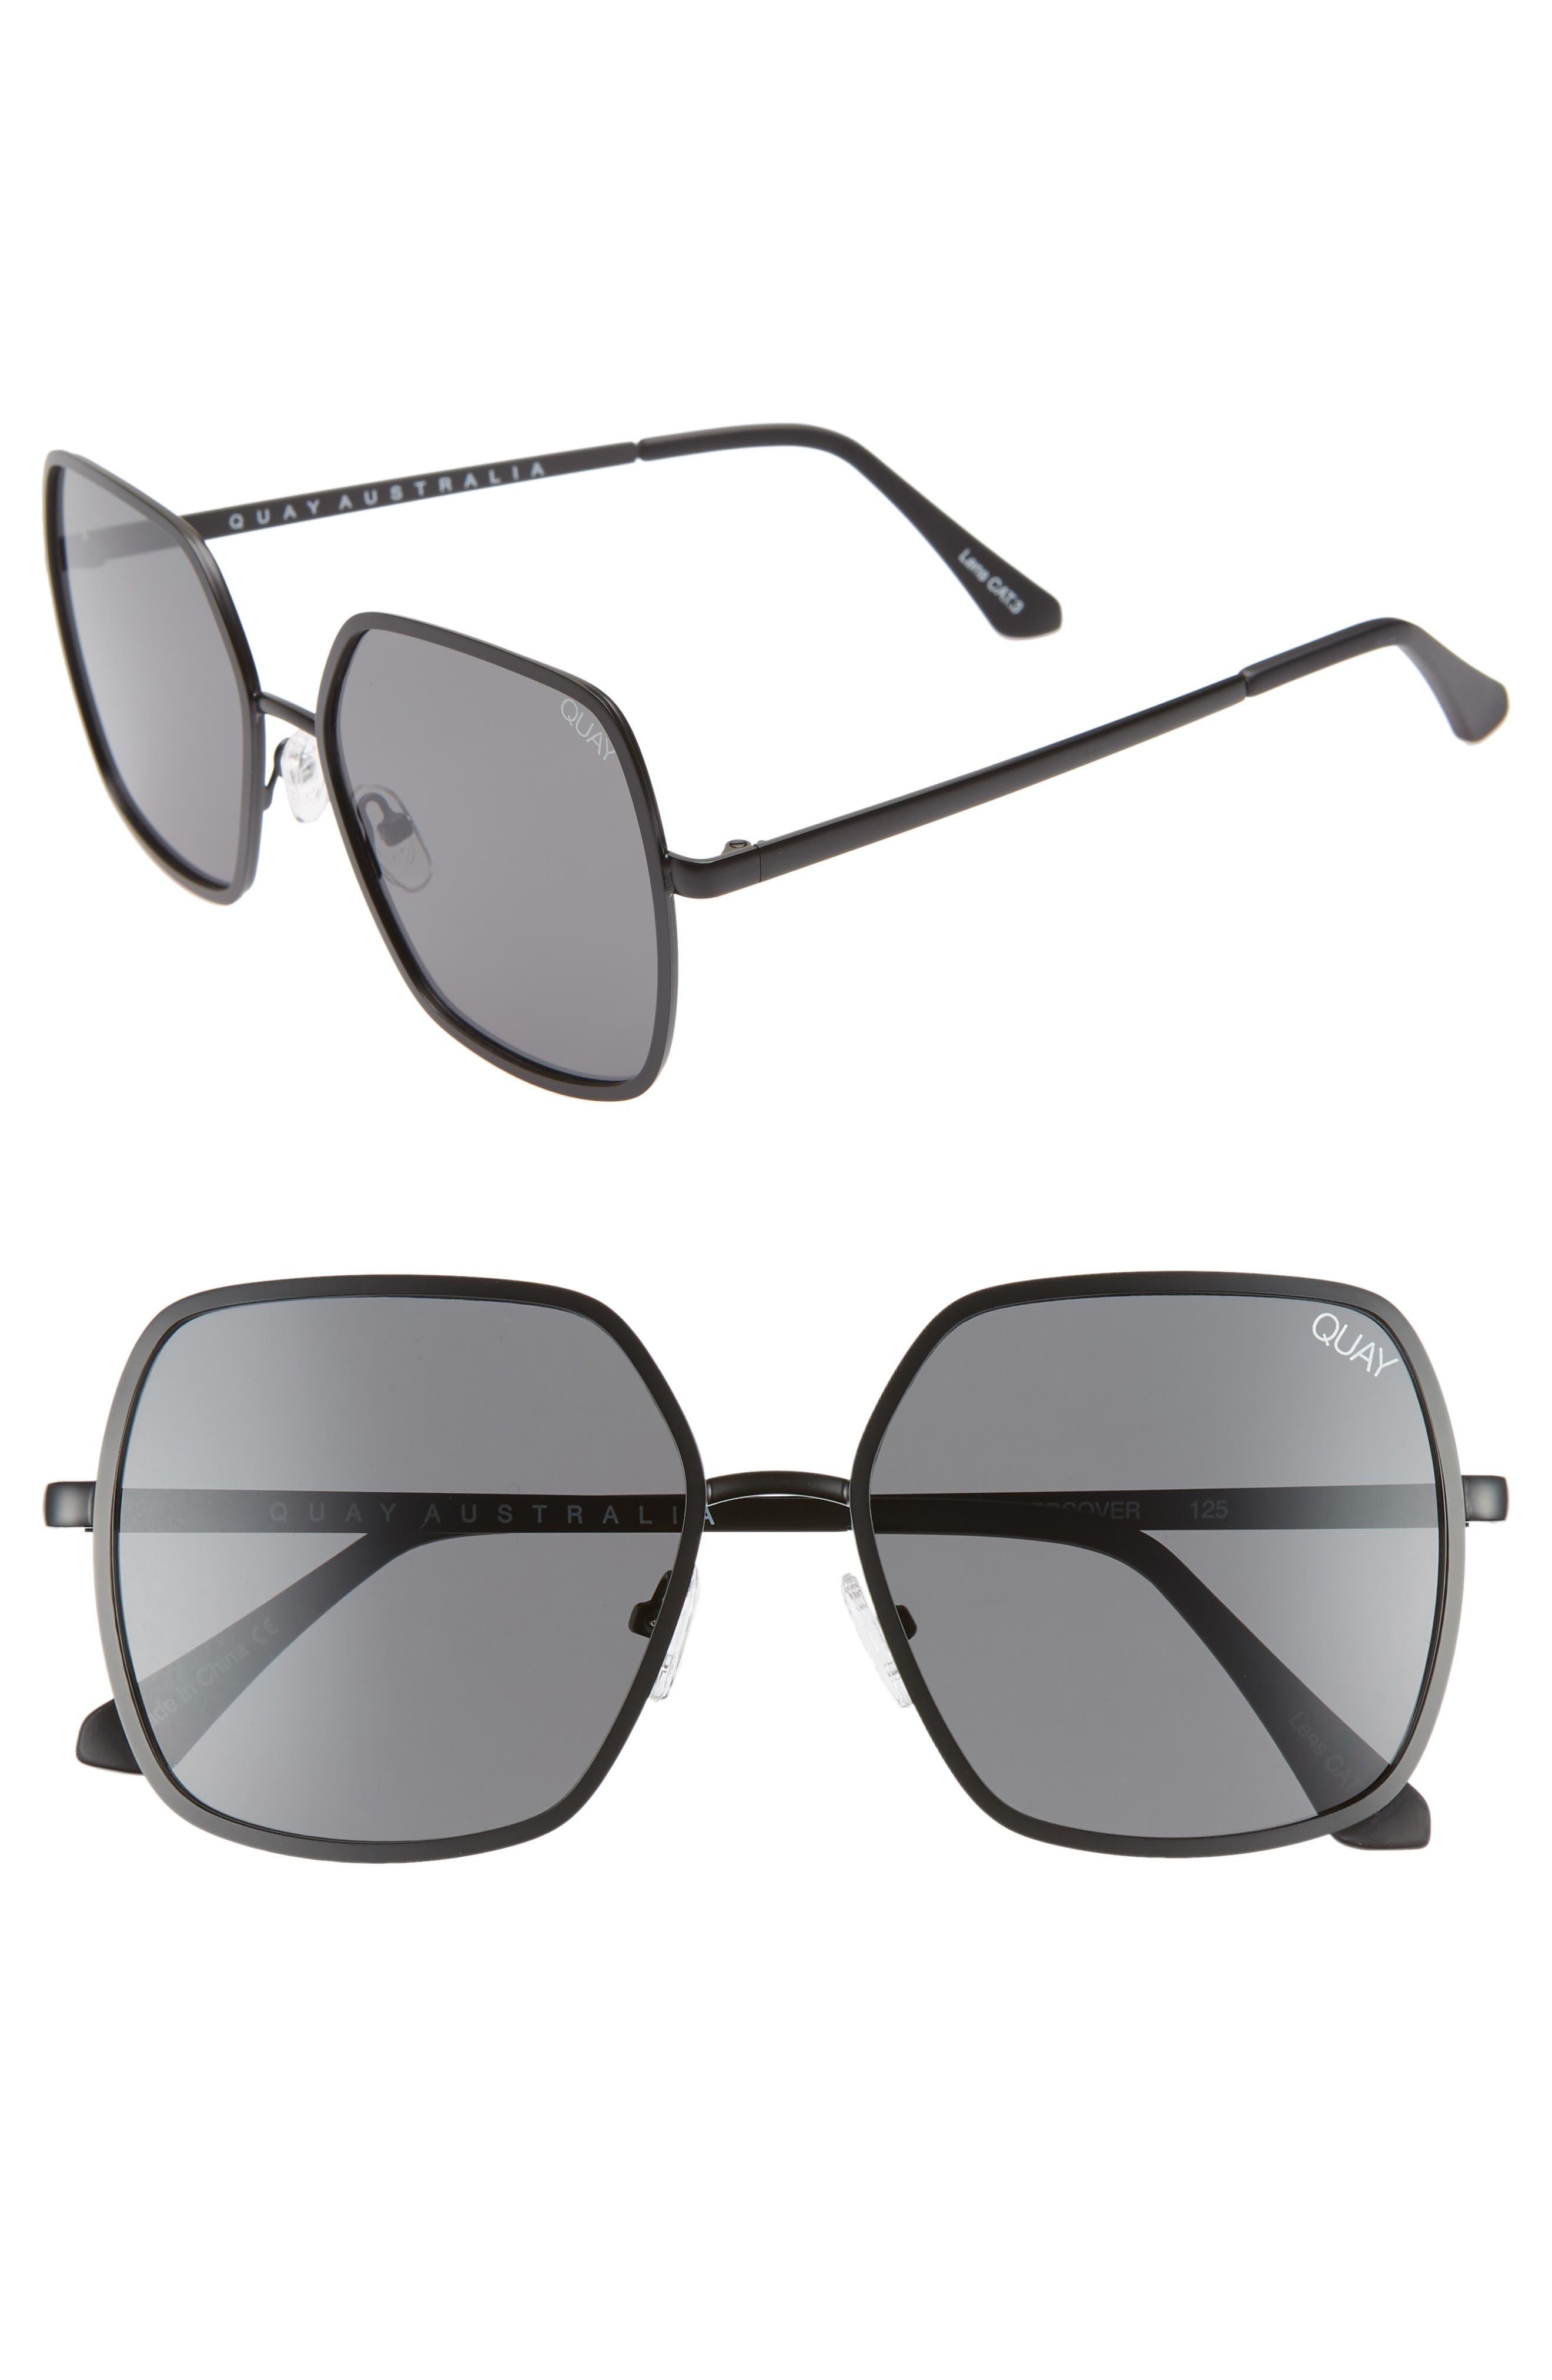 57mm Square Sunglasses,                         Main,                         color, BLACK/ SMOKE